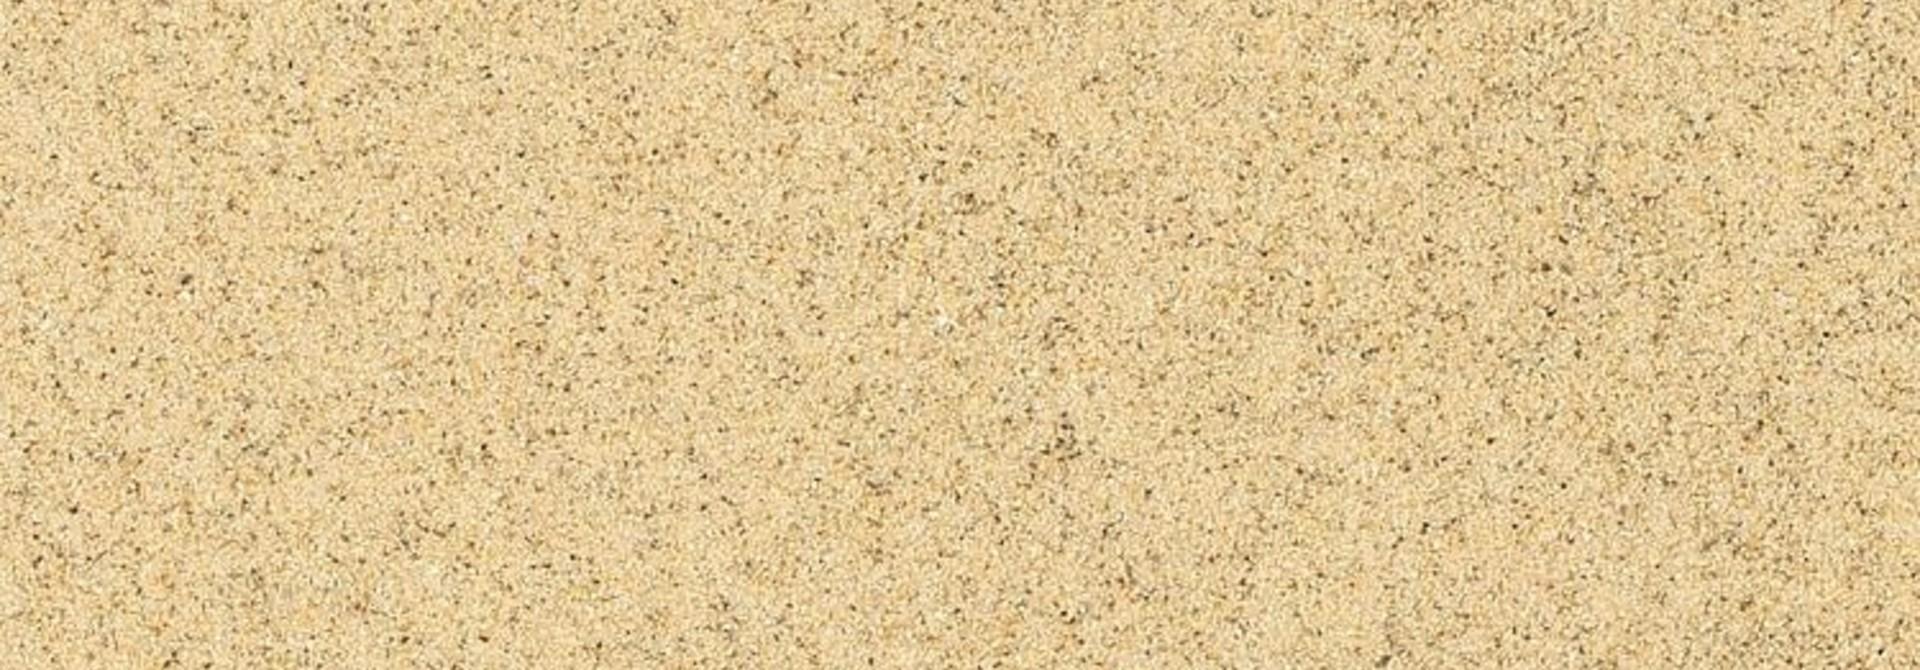 170821 Strooimateriaal zandondergrond, 240 g